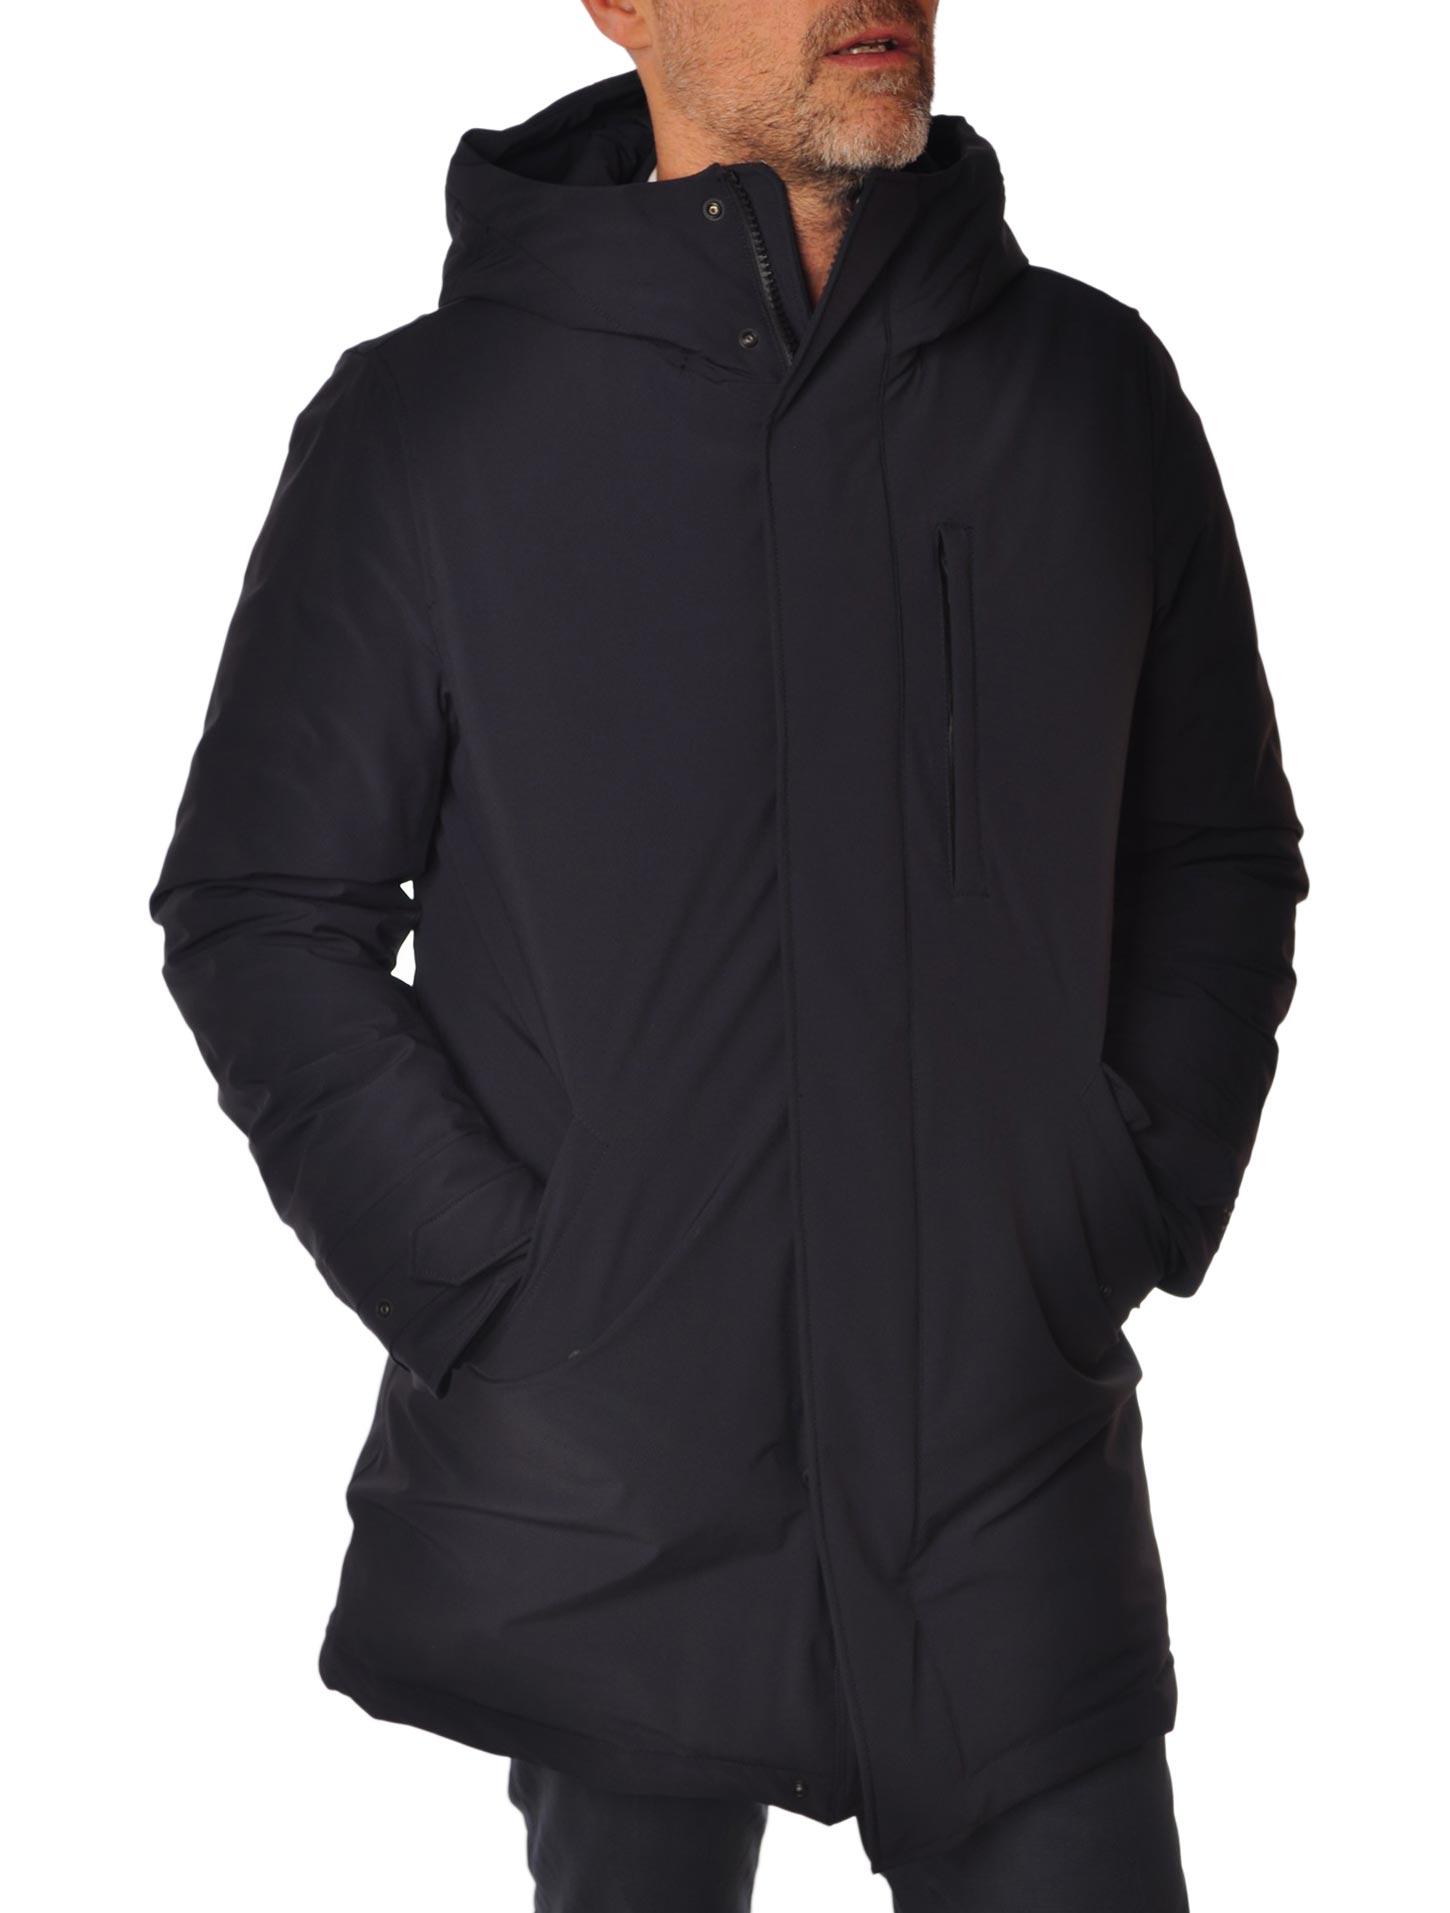 woolrich strech military coats parkas 24261 05b1832414817. Black Bedroom Furniture Sets. Home Design Ideas